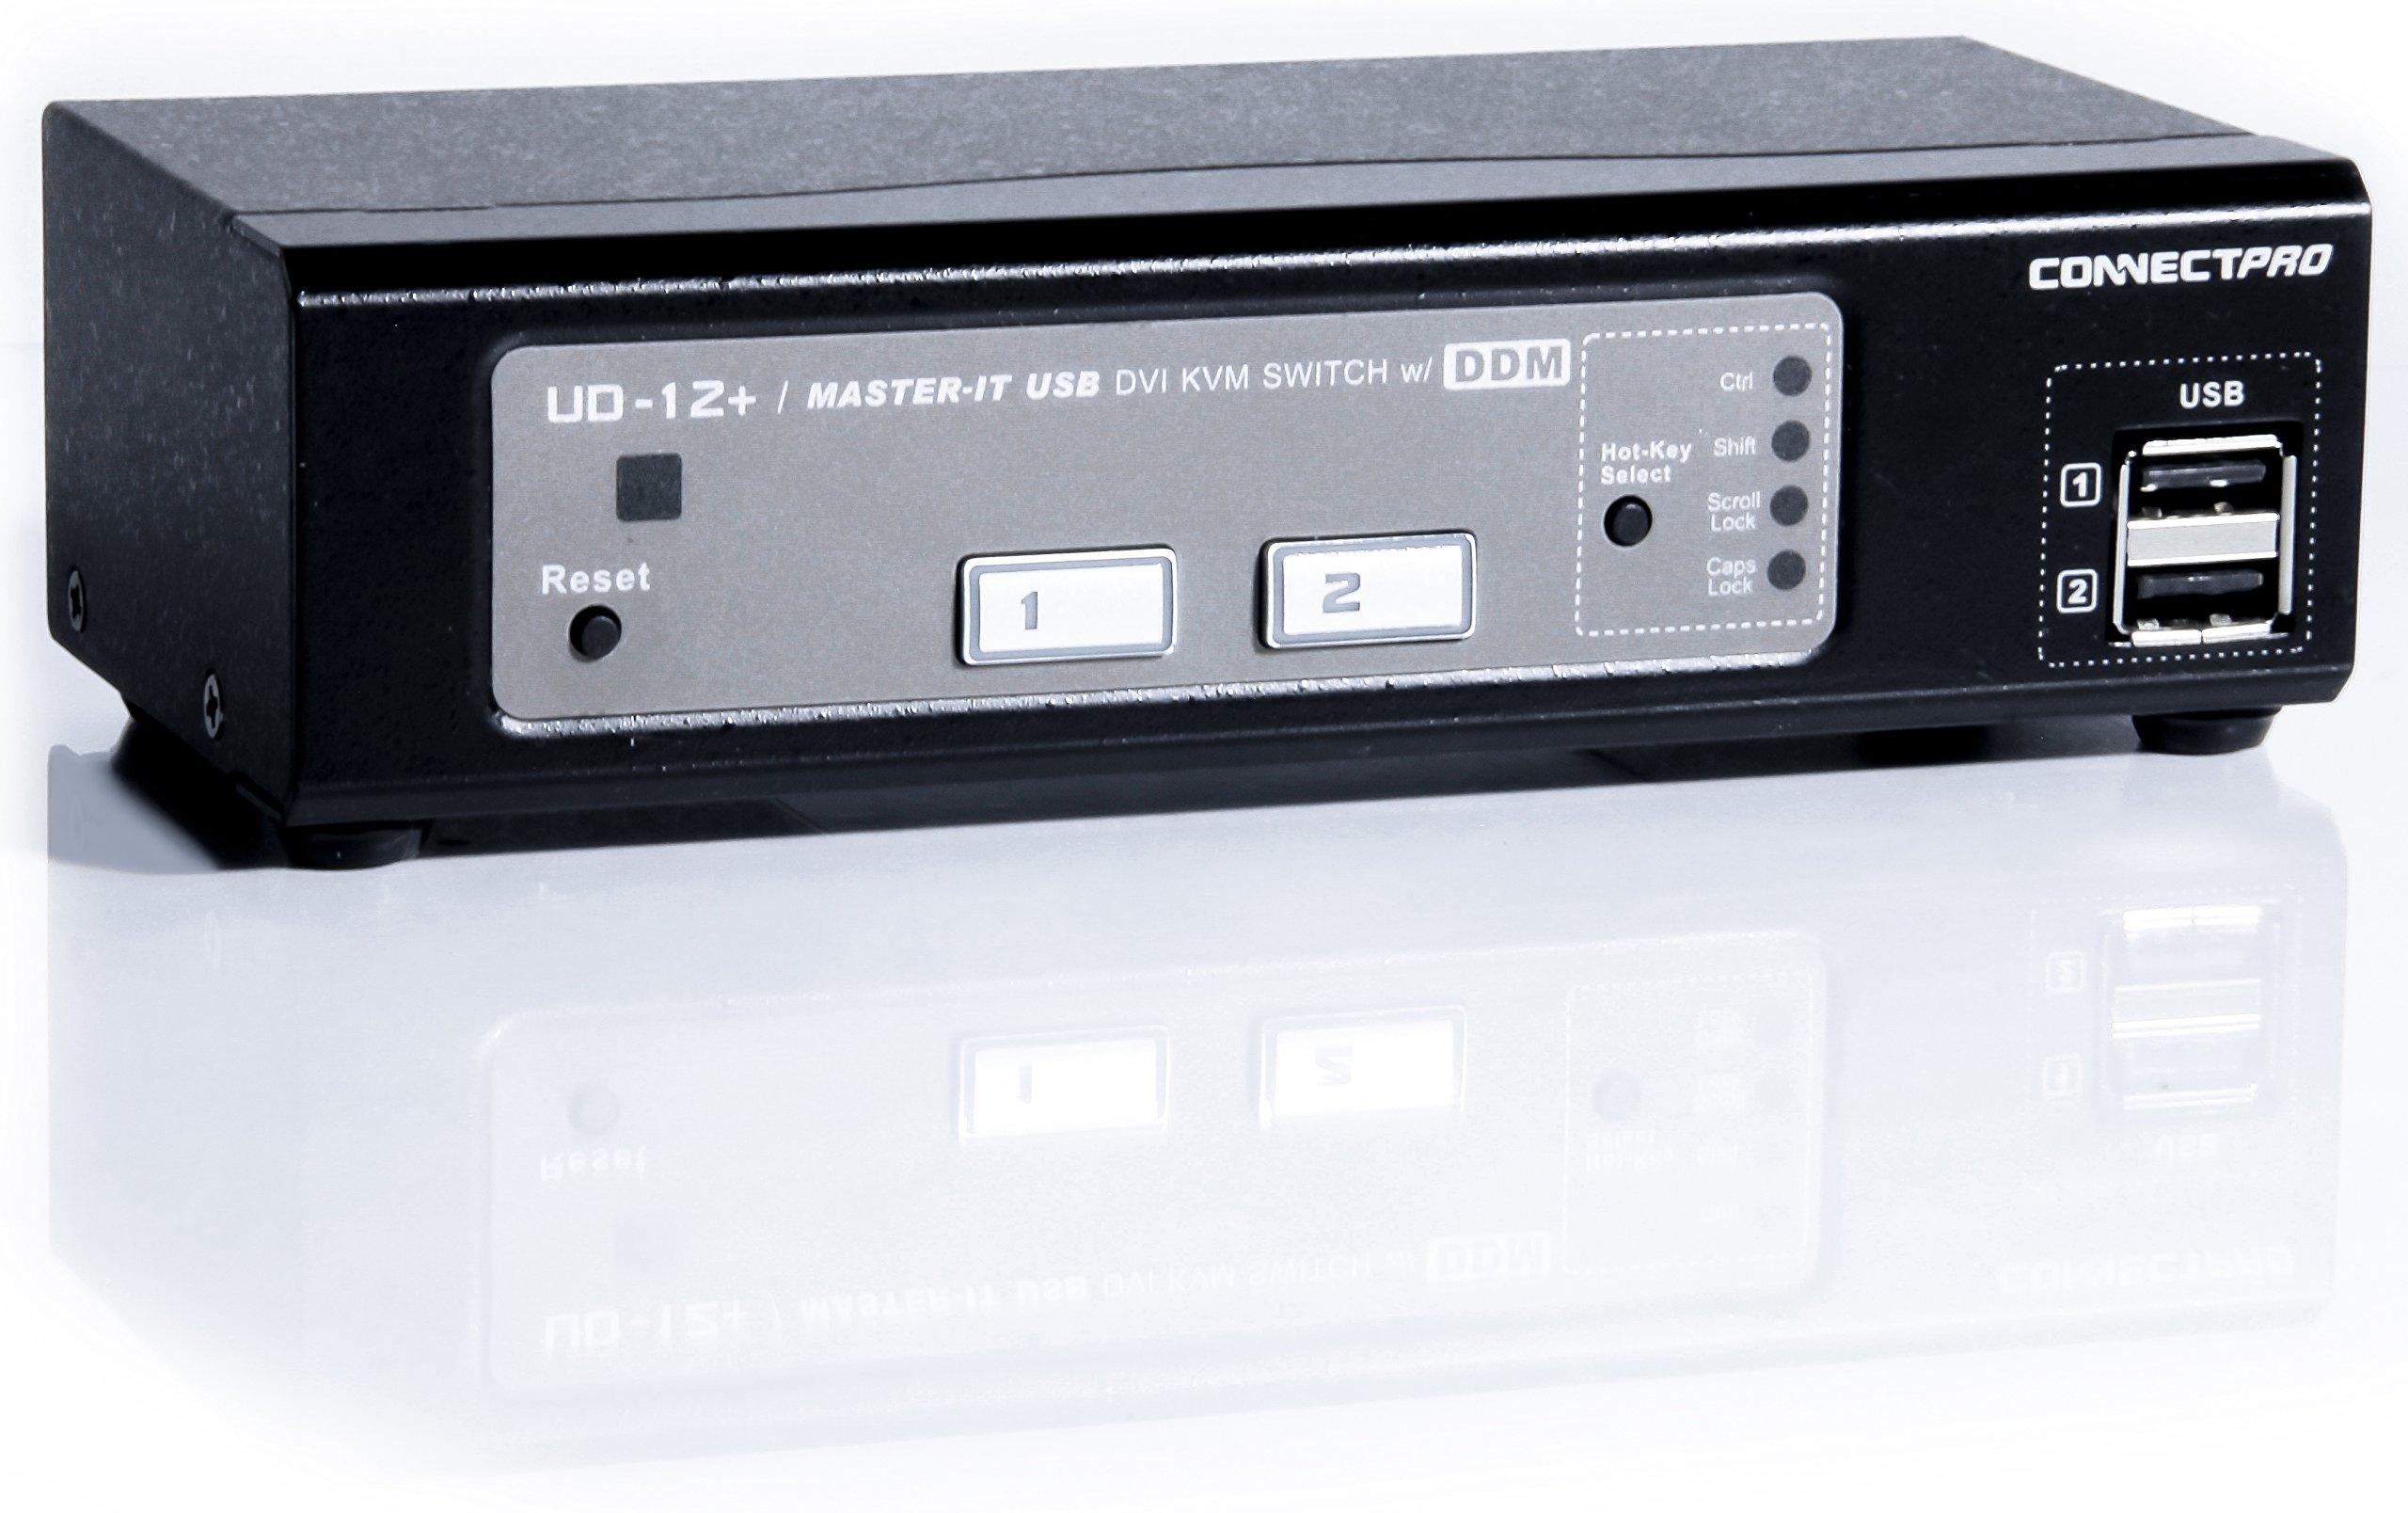 ConnectPRO UD-12+KIT, 2-port USB DVI KVM switch w/ DDM & multi-hotkey